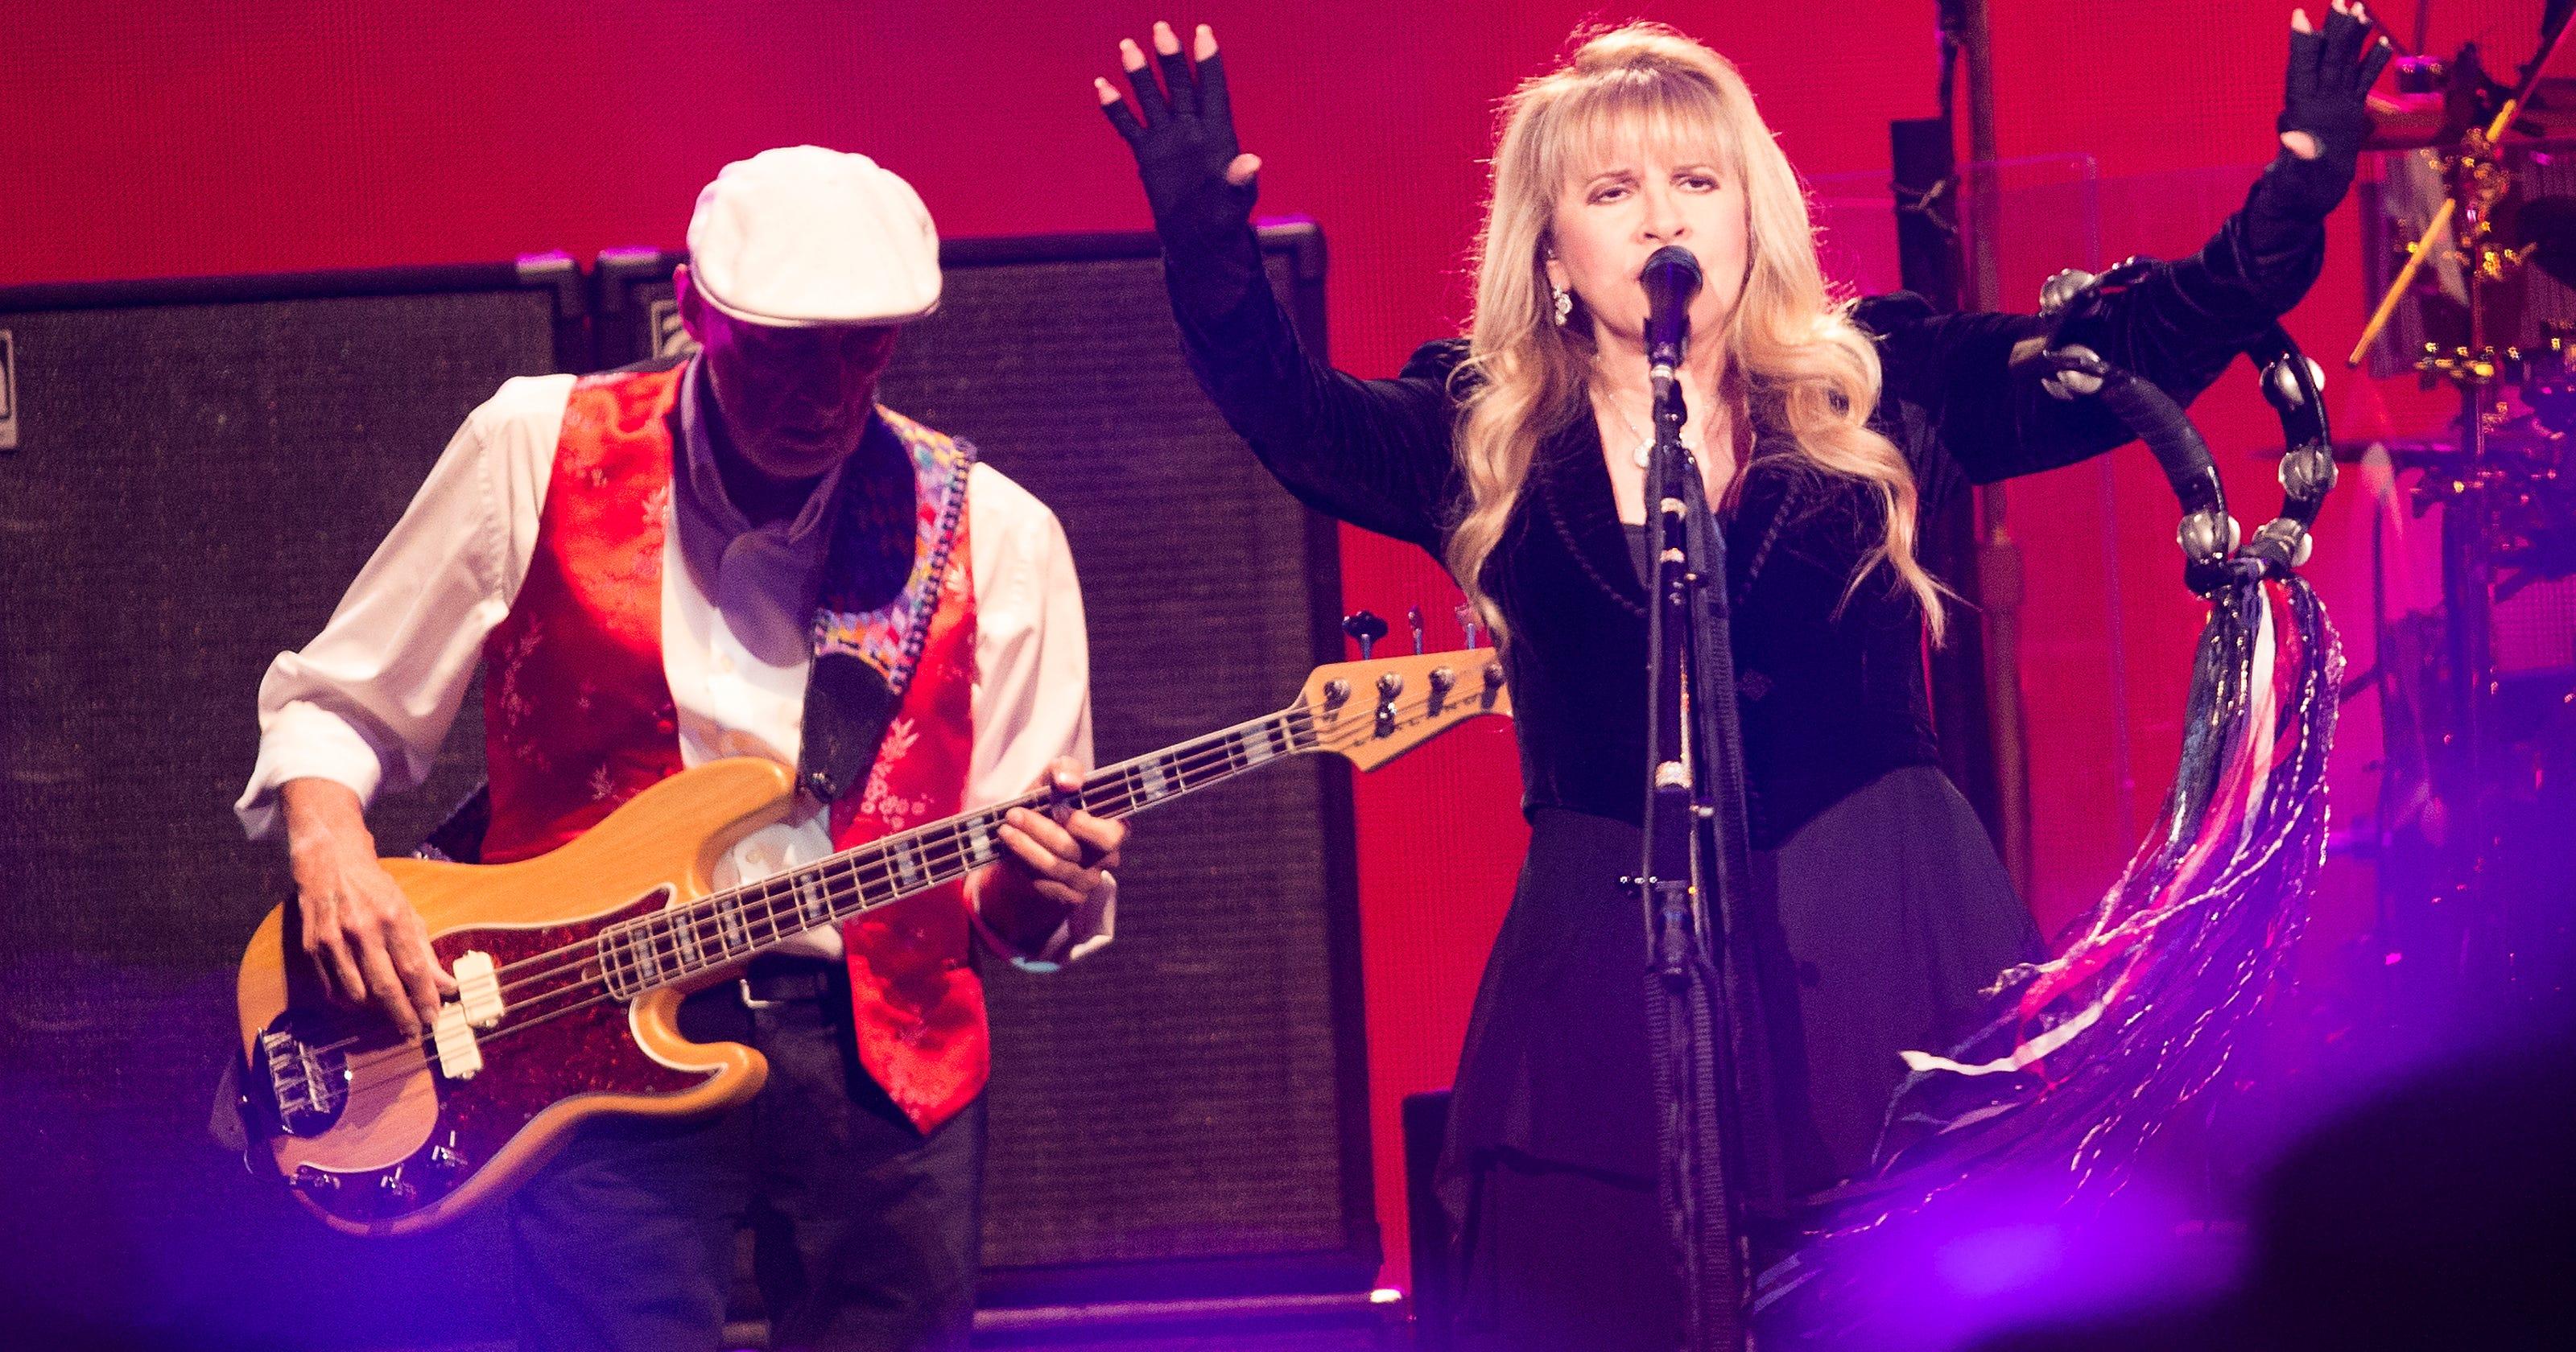 Phoenix concerts in November: Fleetwood Mac, the Story So